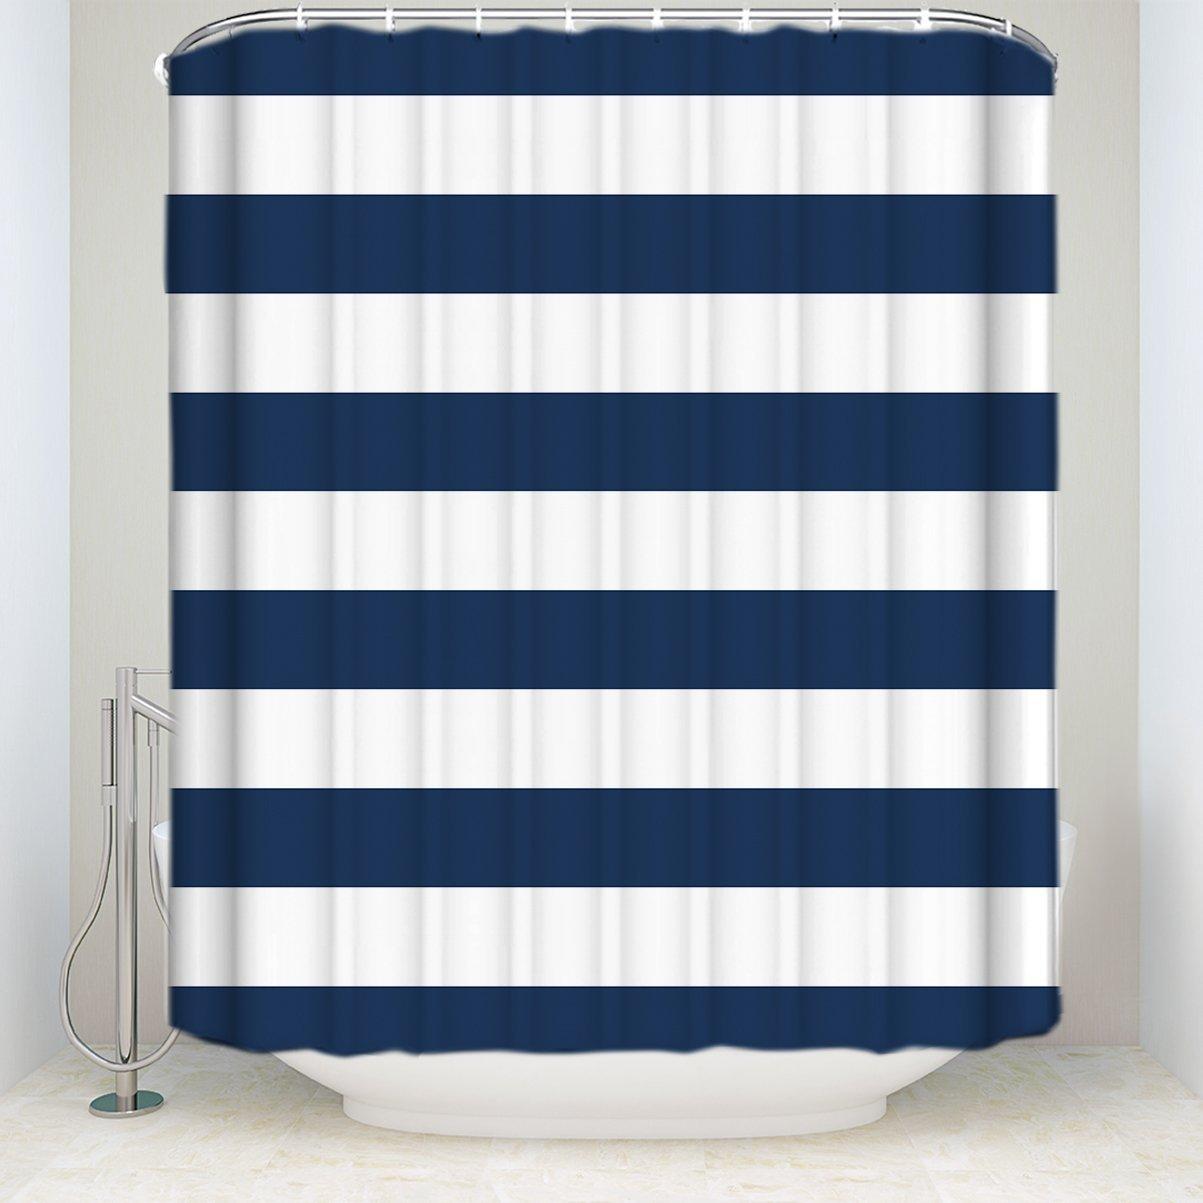 Amazon.com: Fabric Shower Curtain: Nautical Stripe Design (Navy and ...